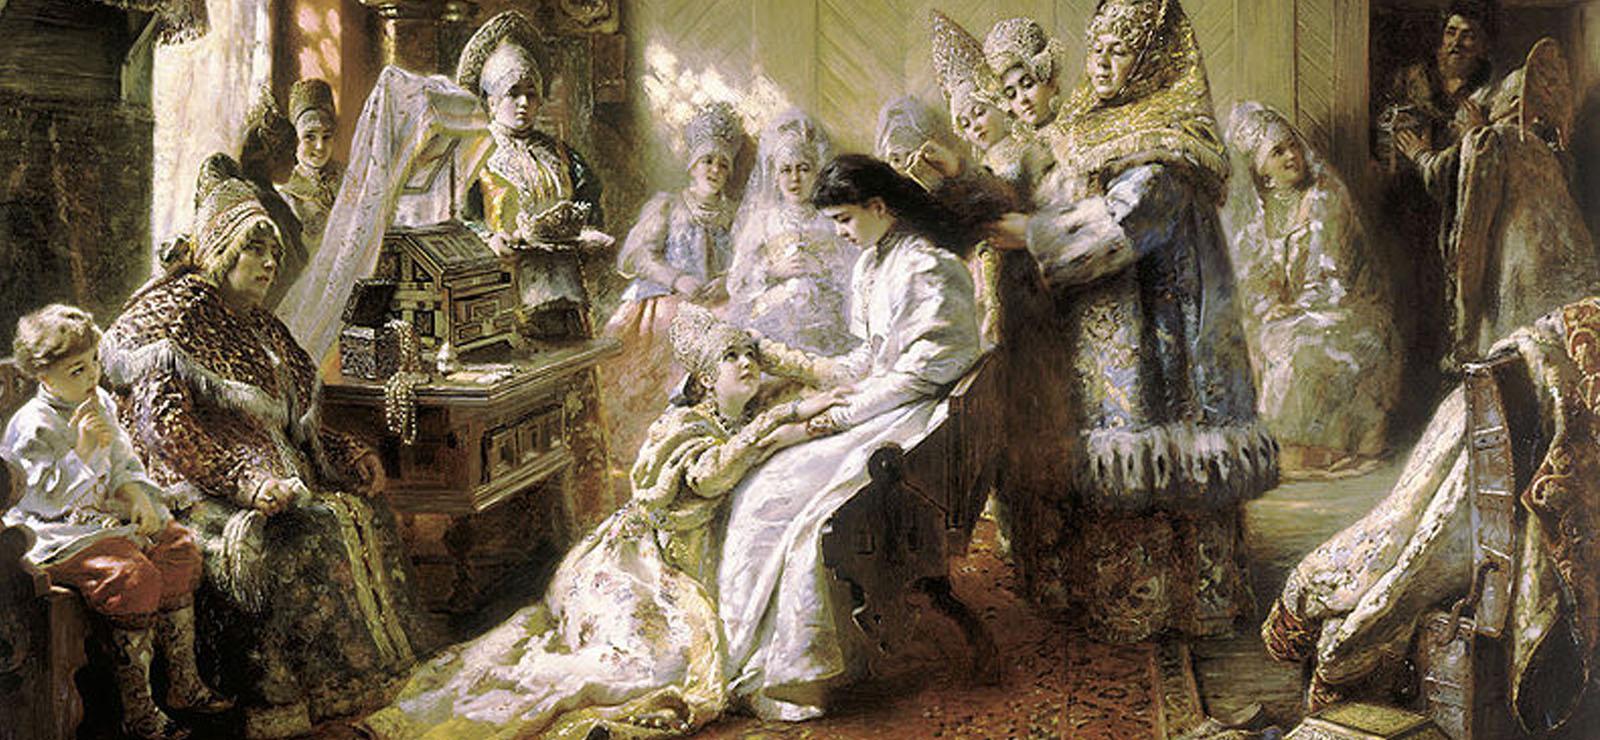 [Program Twelve:The Tsar's Bride] The Russian Bride (1884) by Konstantin Makovsky